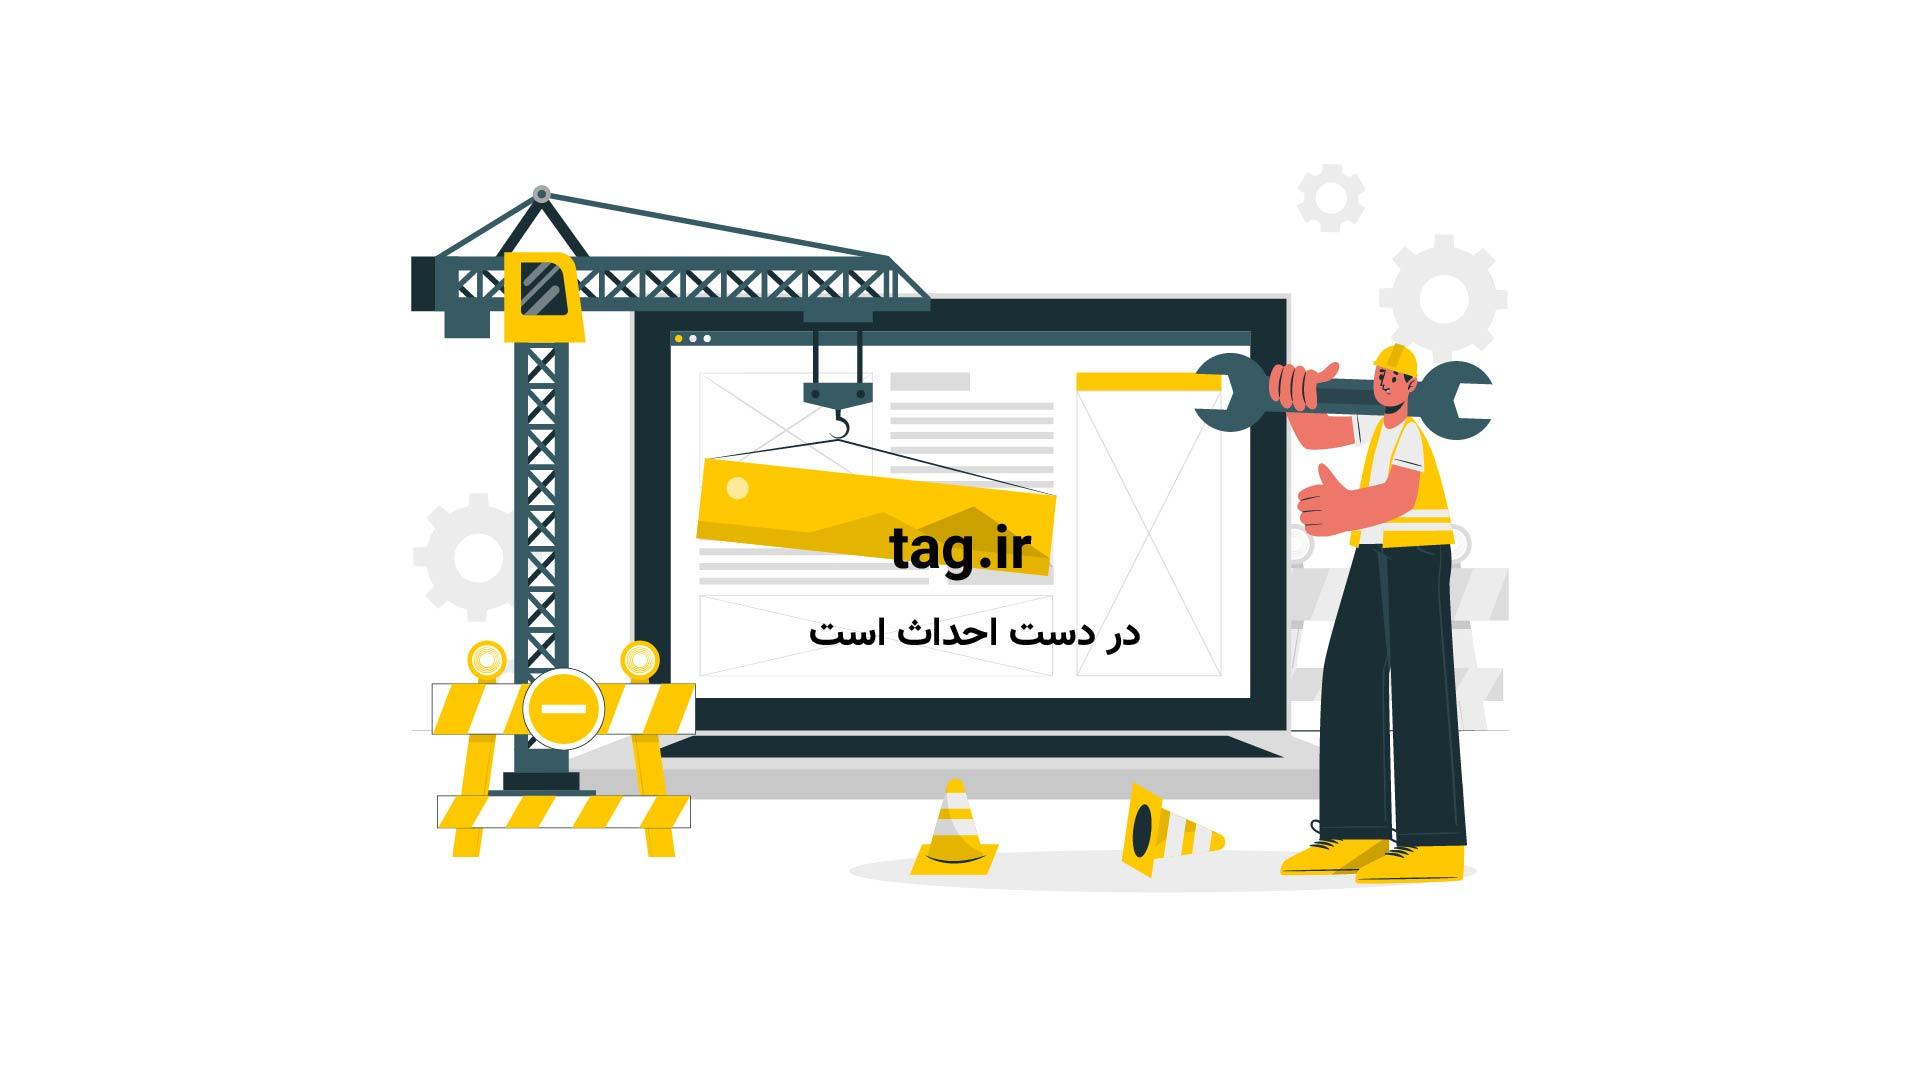 انیمیشن لاروا | تگ